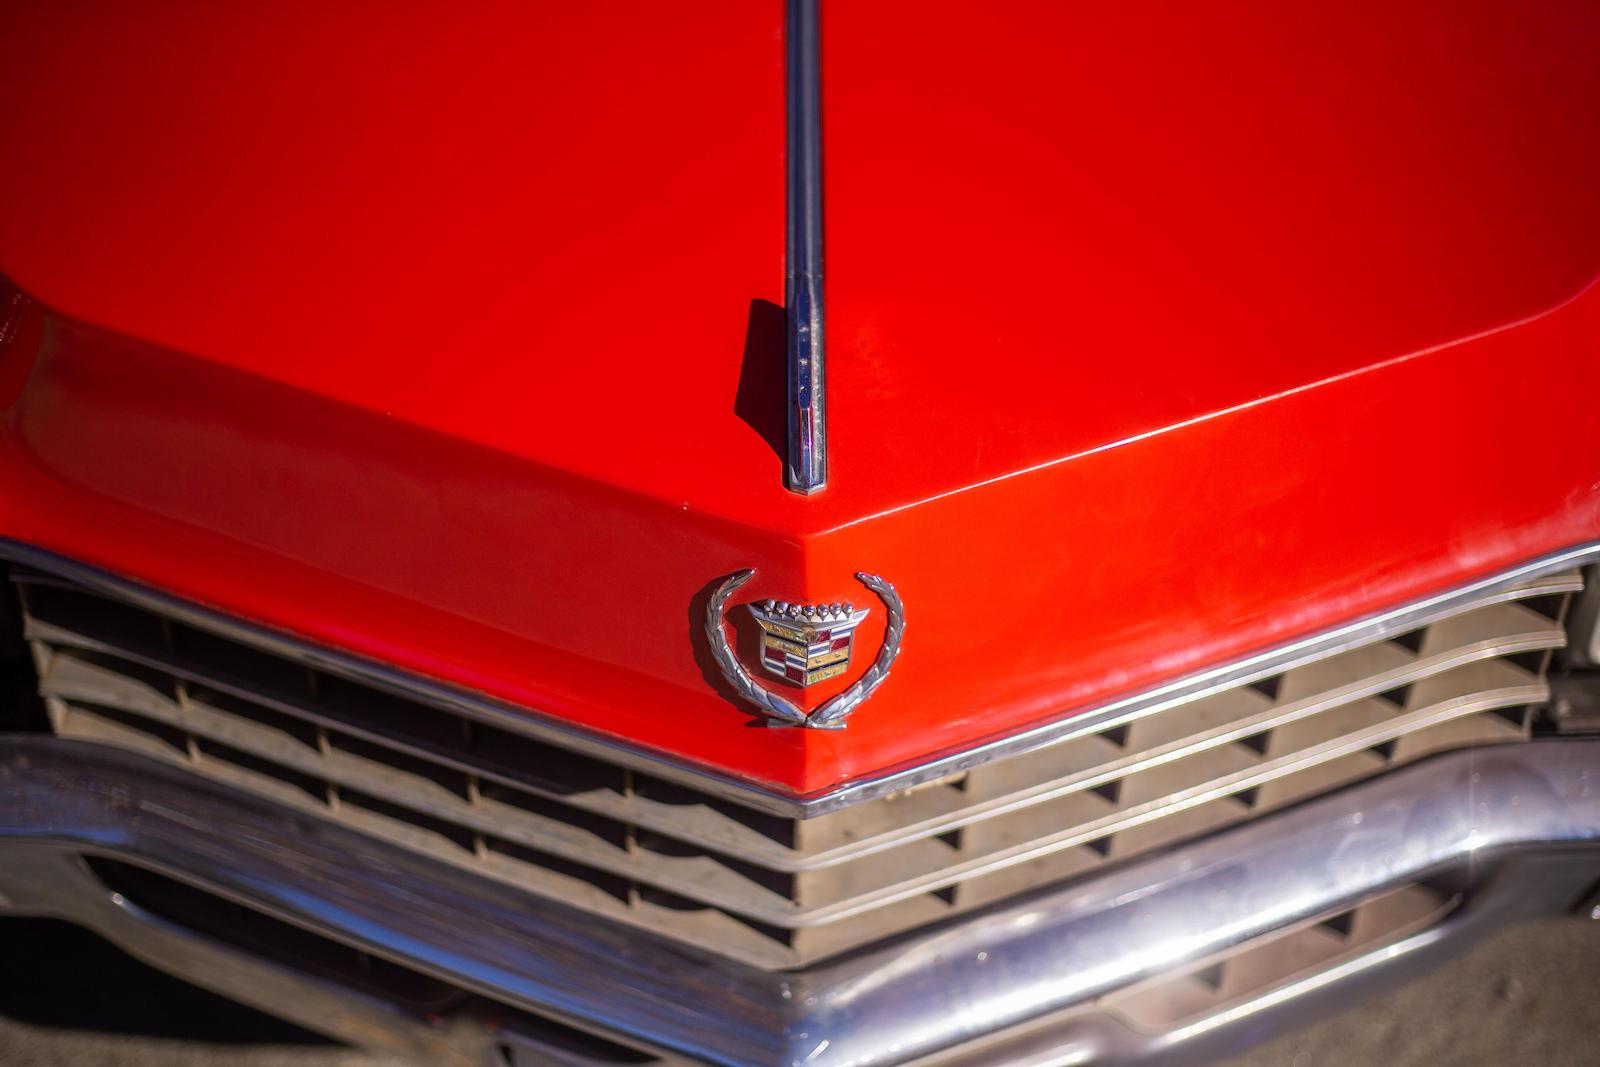 1967 Cadillac Eldorado front hood emblem